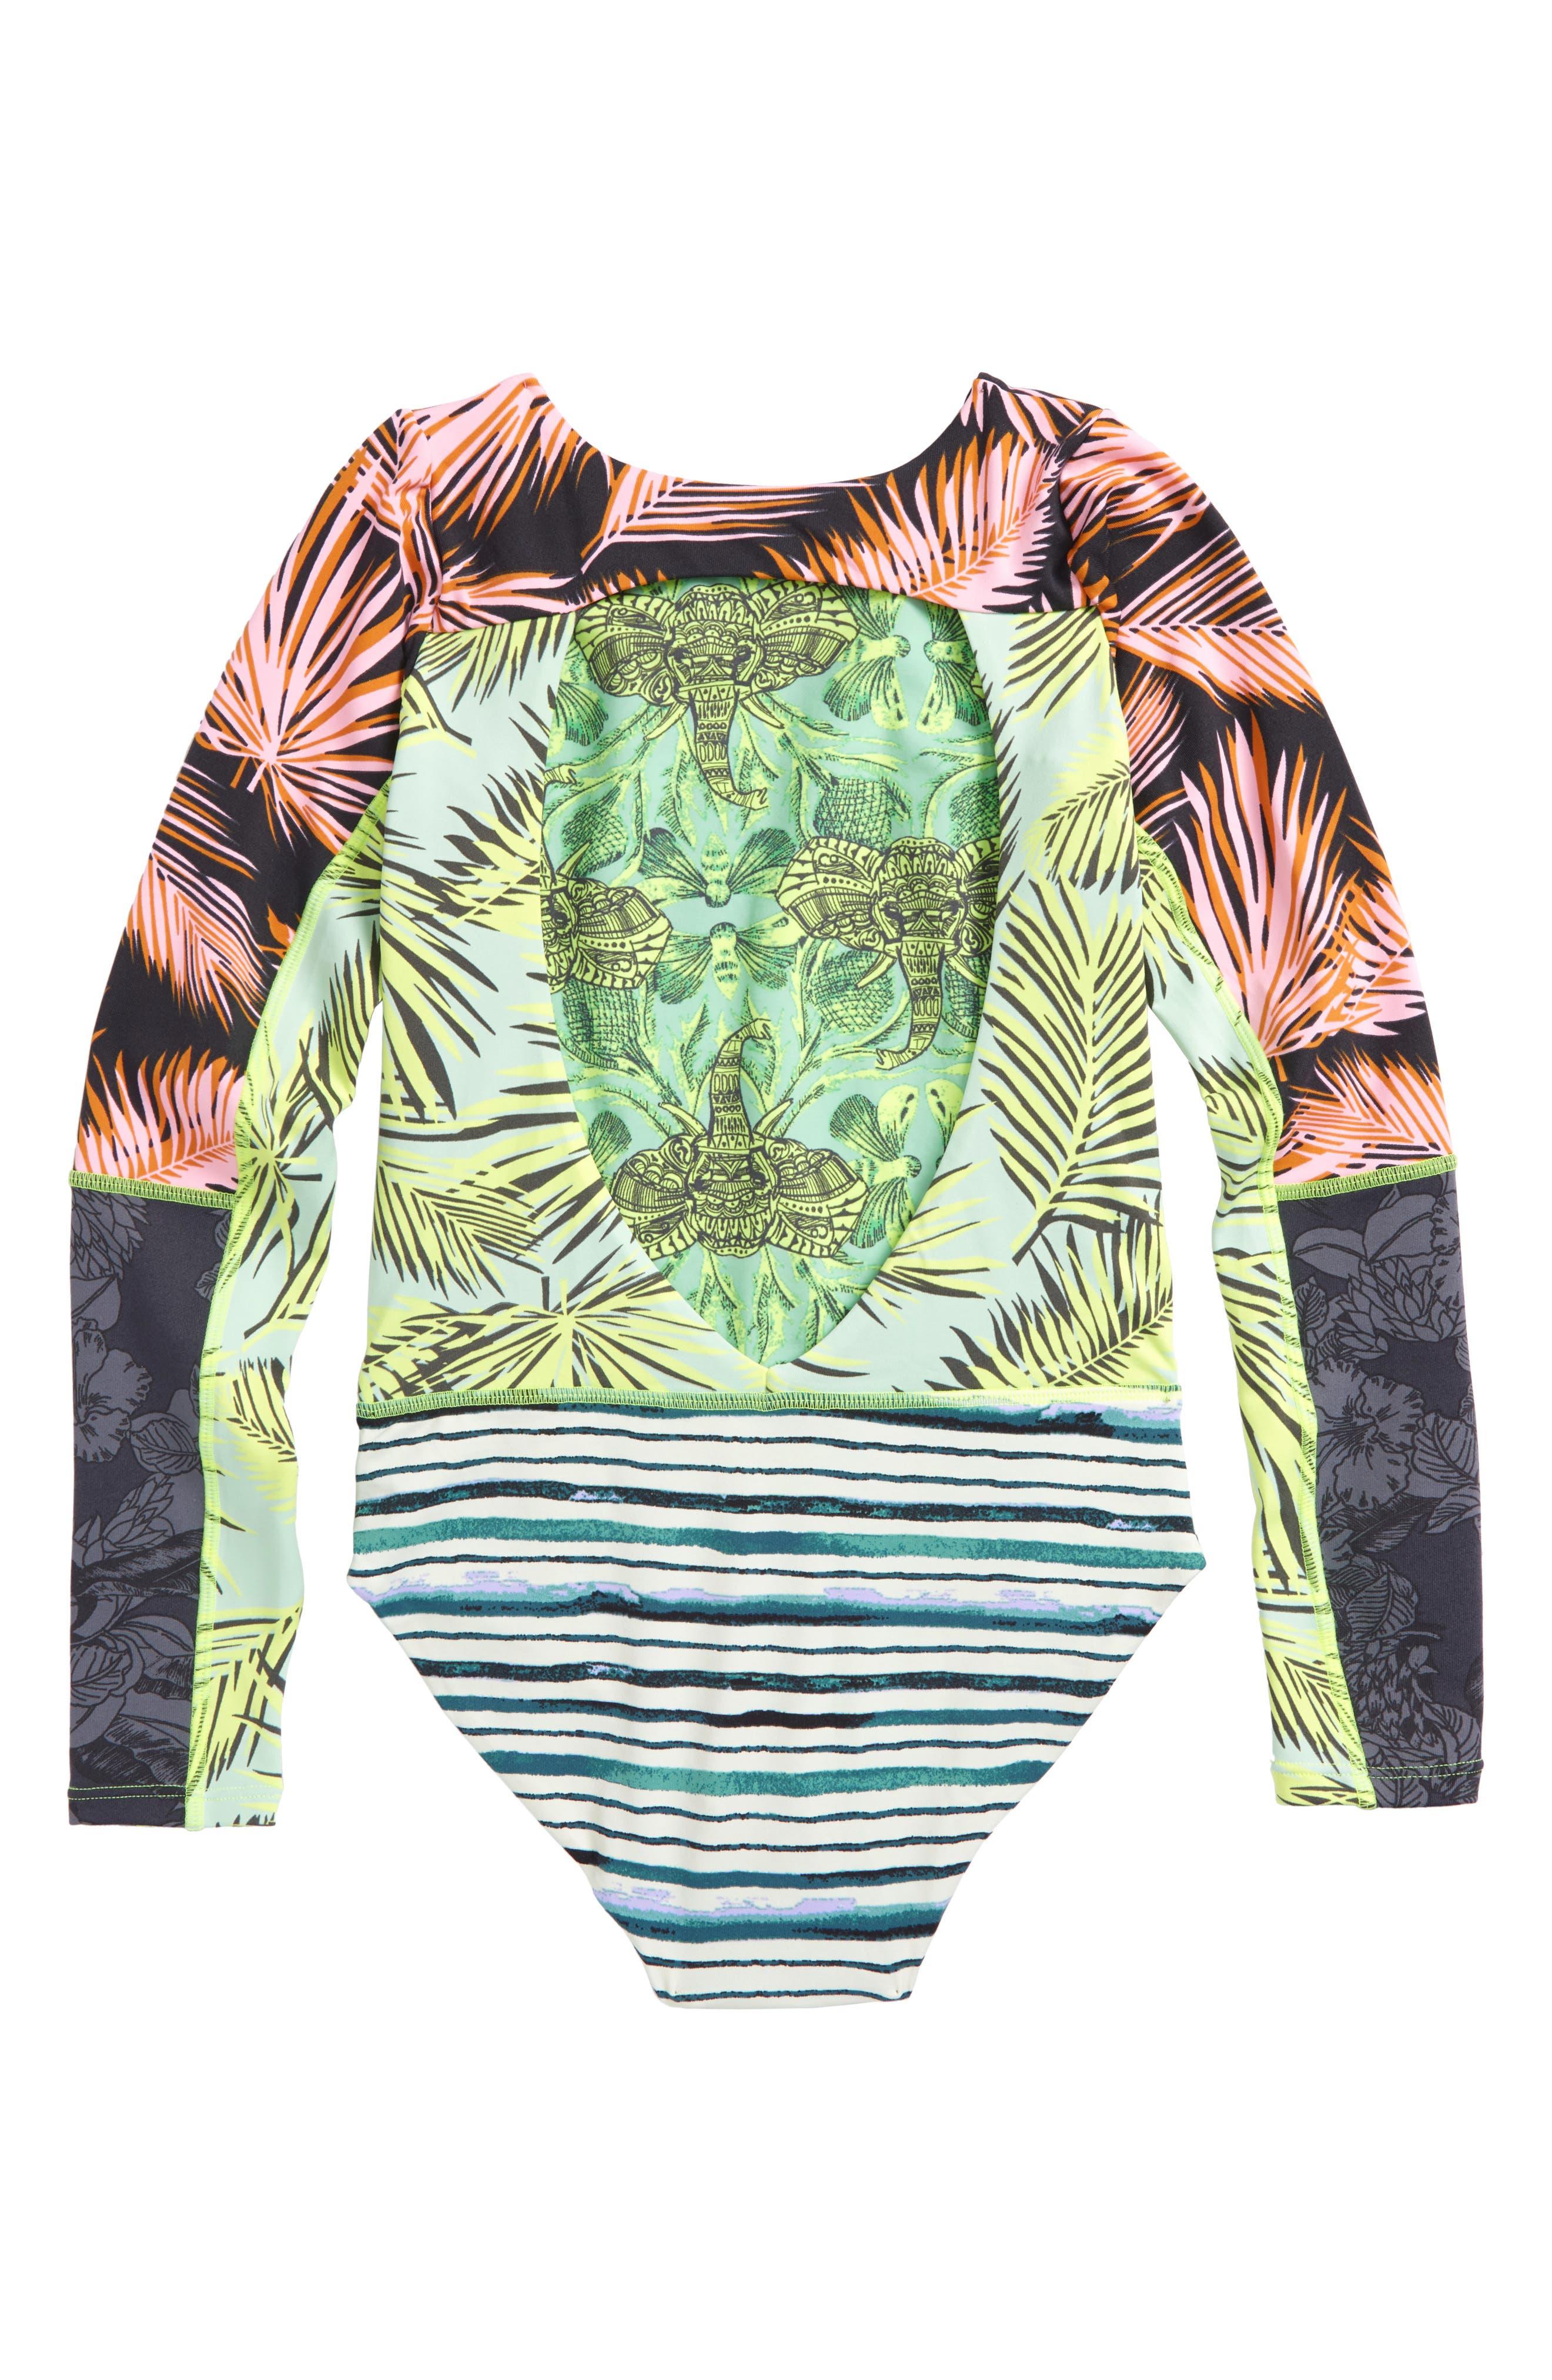 Greenwoods Long Sleeve Rashguard Swimsuit,                             Alternate thumbnail 2, color,                             Green